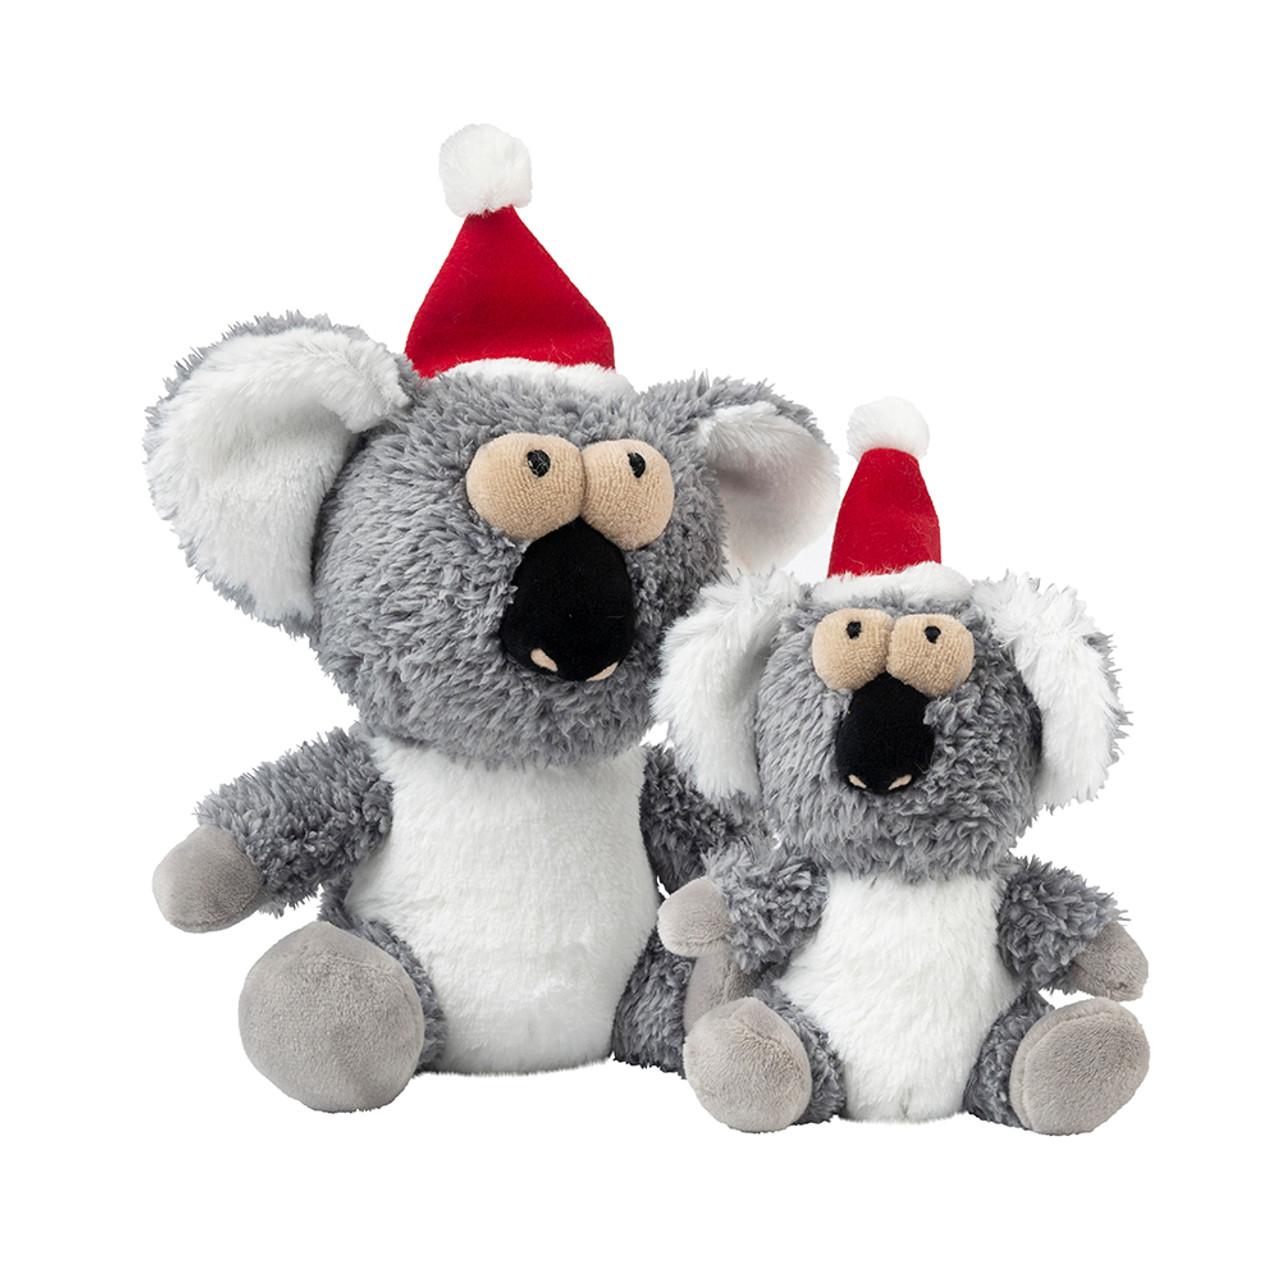 FuzzYard Holiday Kana The Koala Plush Dog Toy